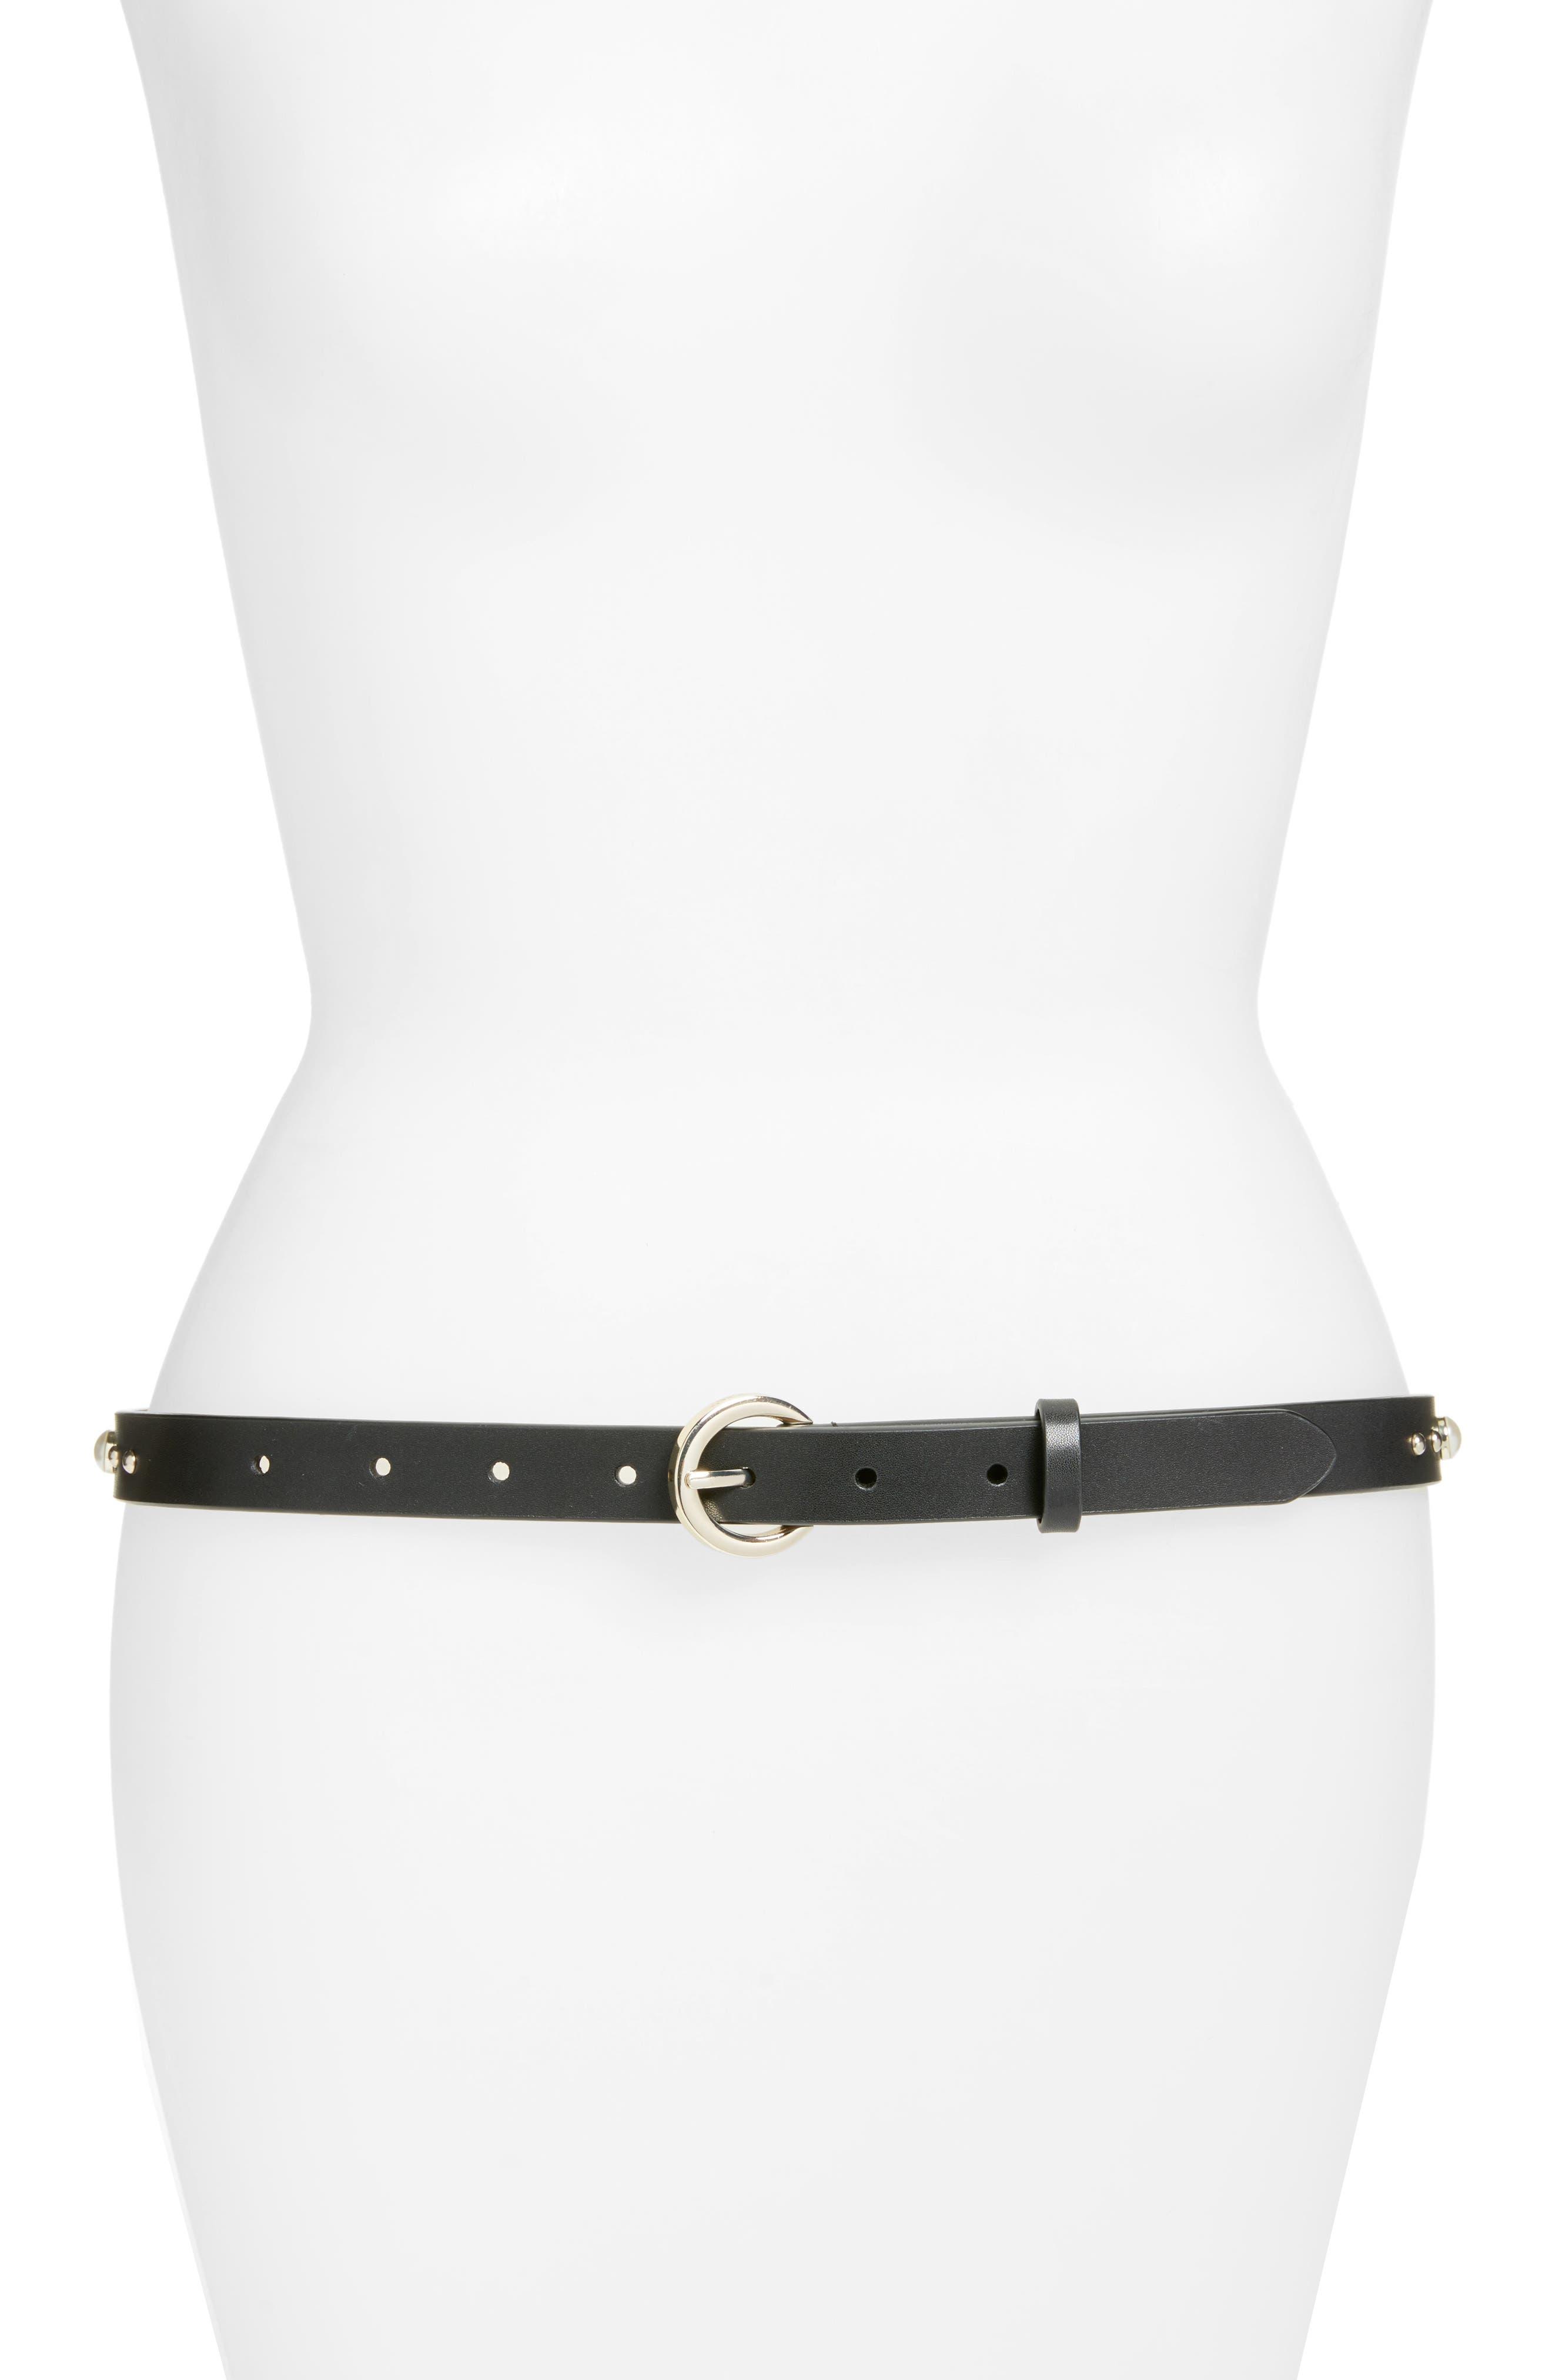 Alternate Image 1 Selected - Rebecca Minkoff Imitation Pearl & Stud Smooth Leather Belt